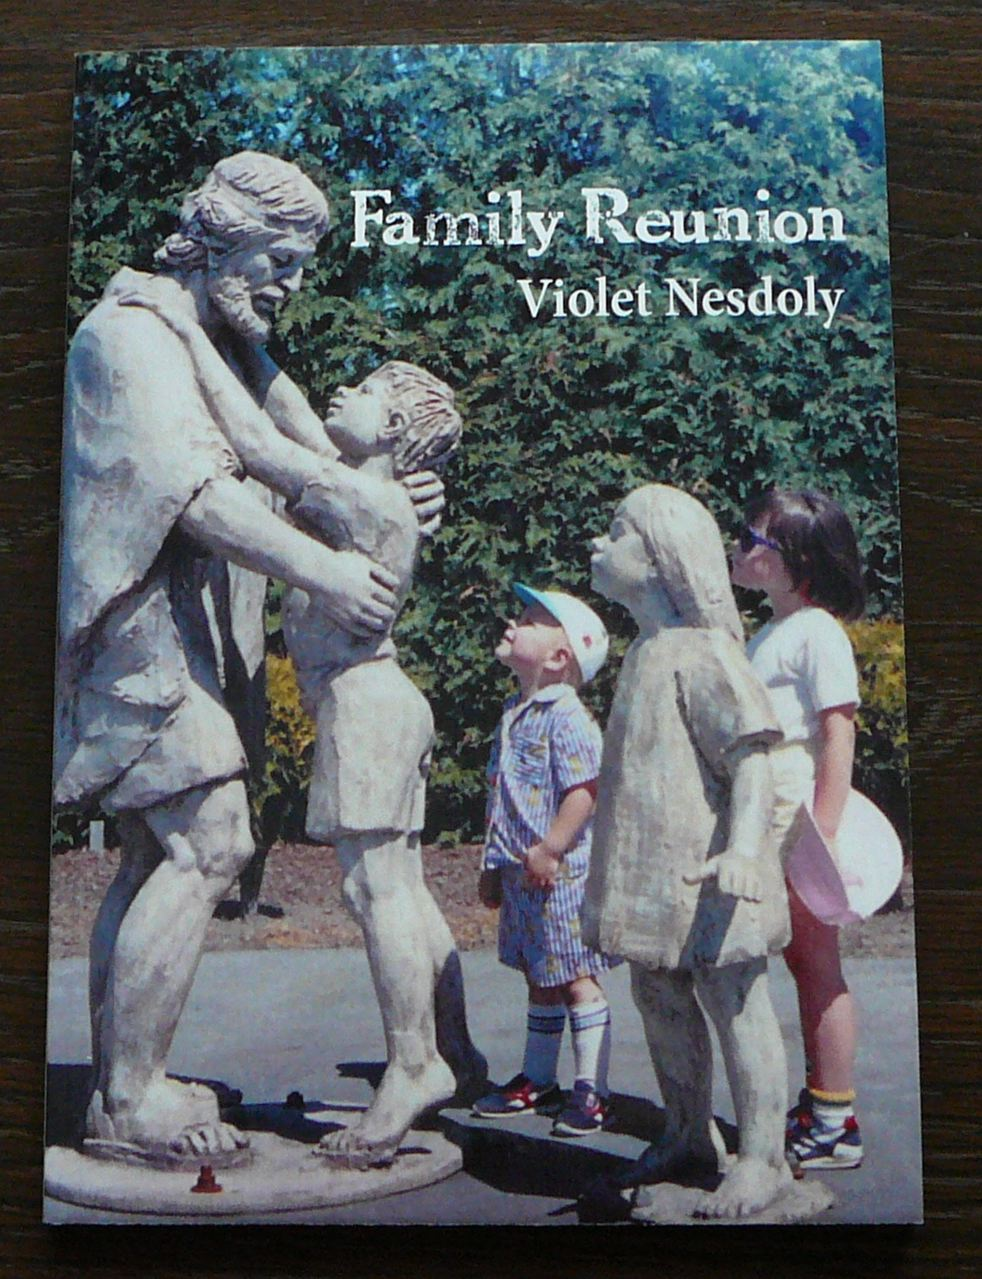 FamilyReunion